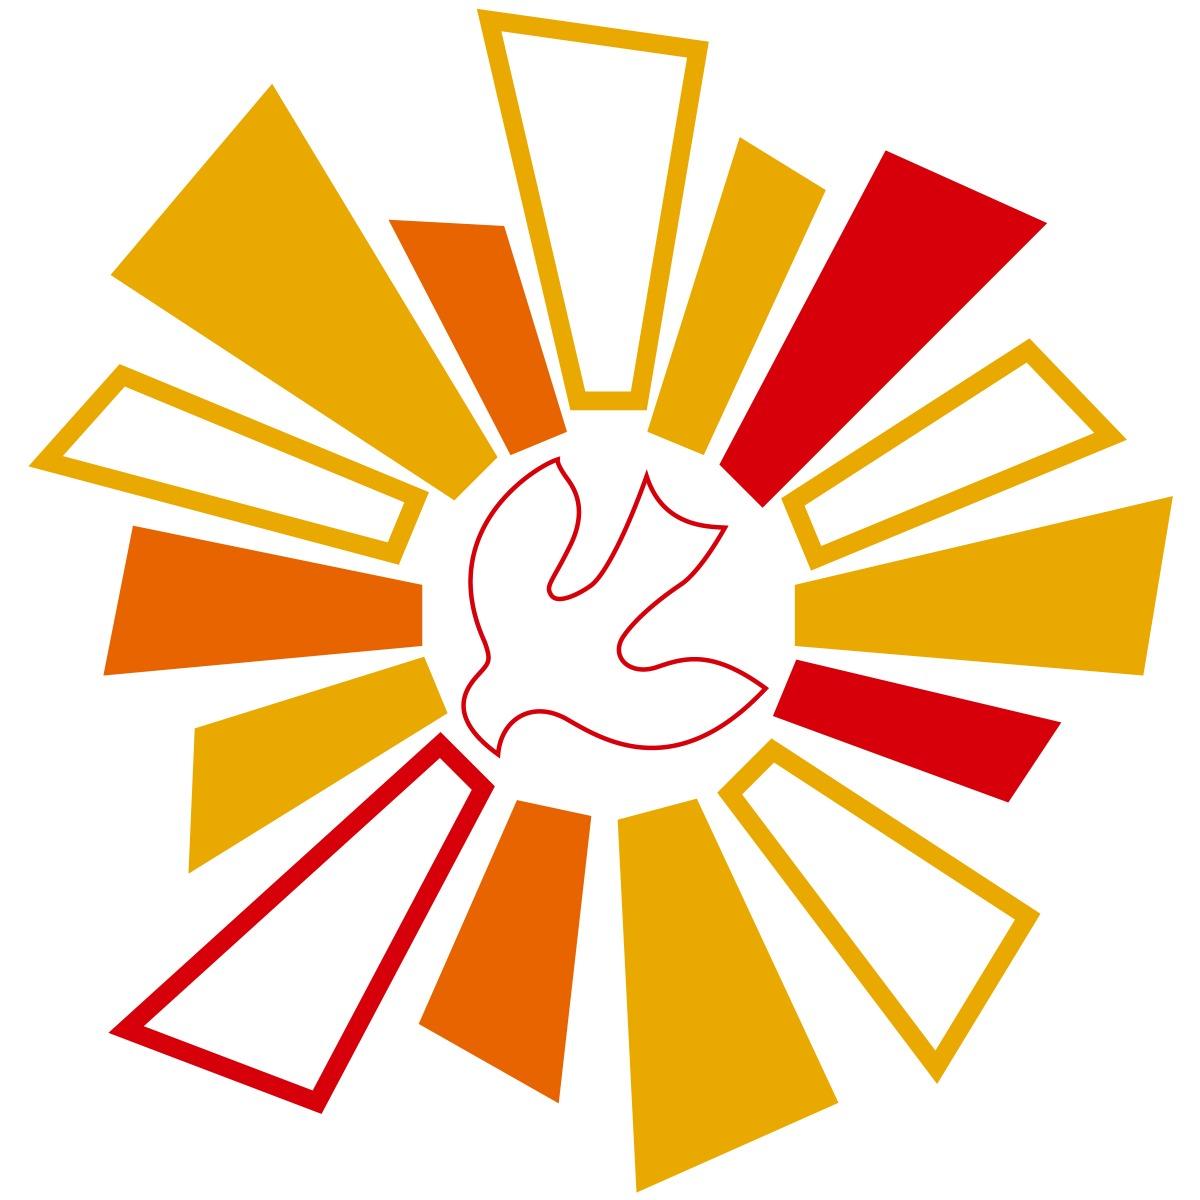 Joyfully gifted parish retreat st francis xavier catholic church joyfully gifted logo dove sunsm buycottarizona